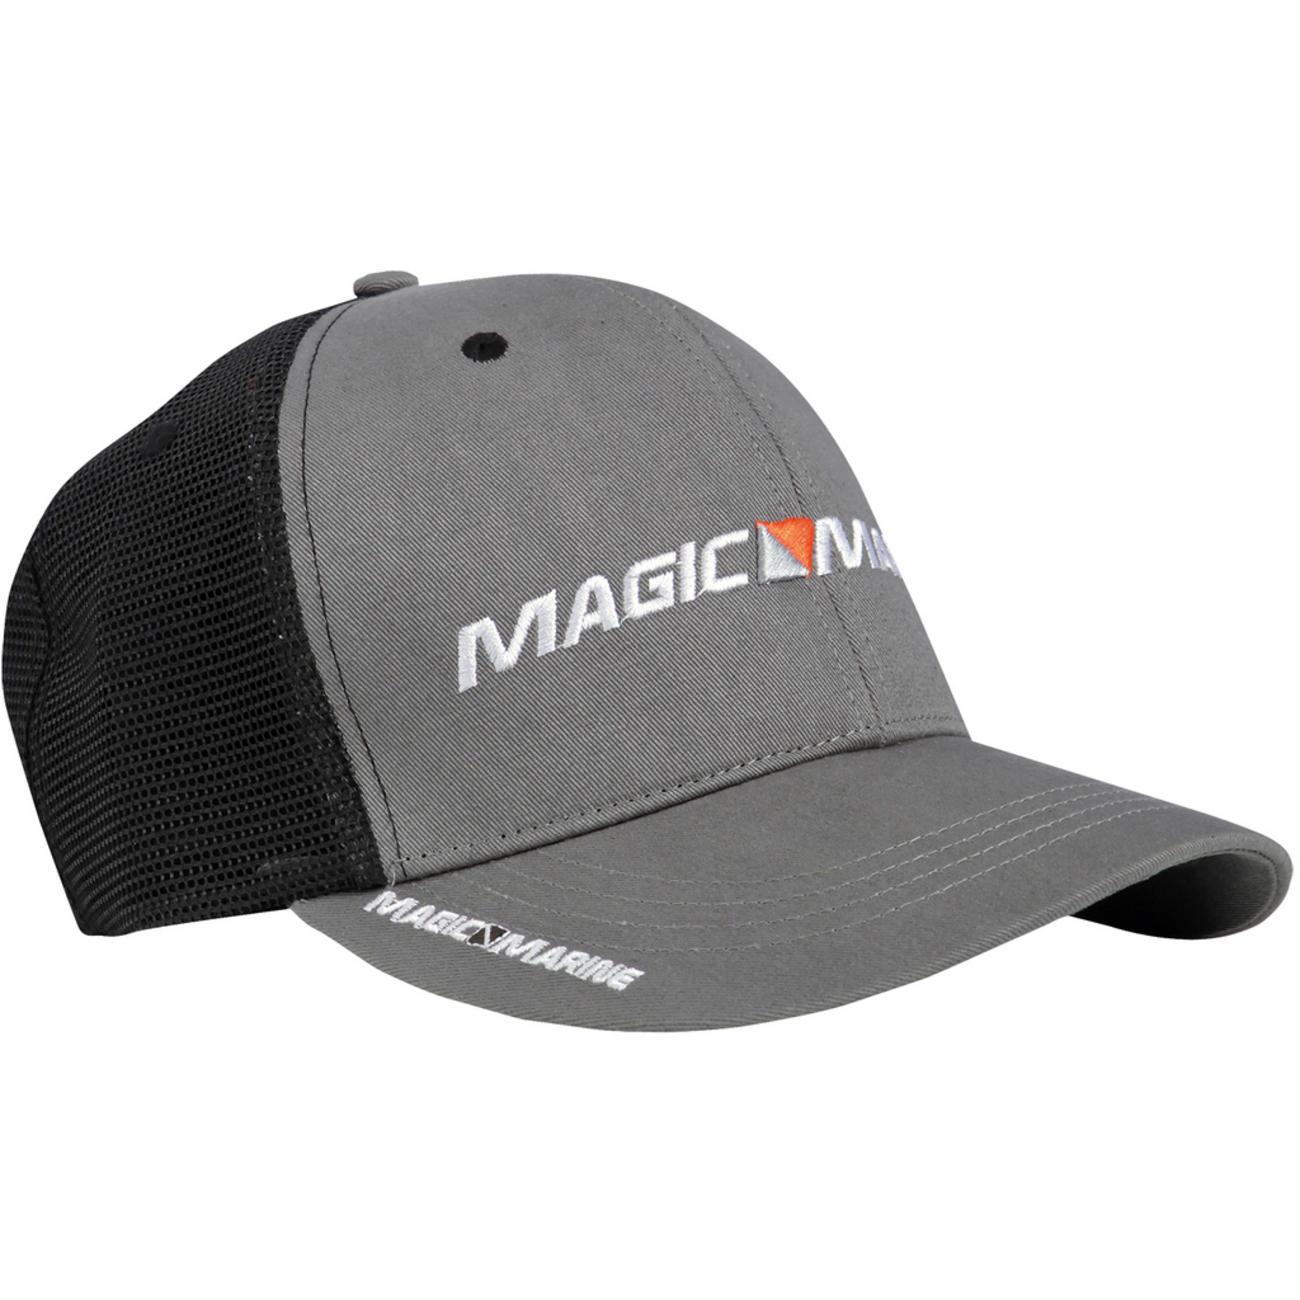 MARINE TRUCKER CAP